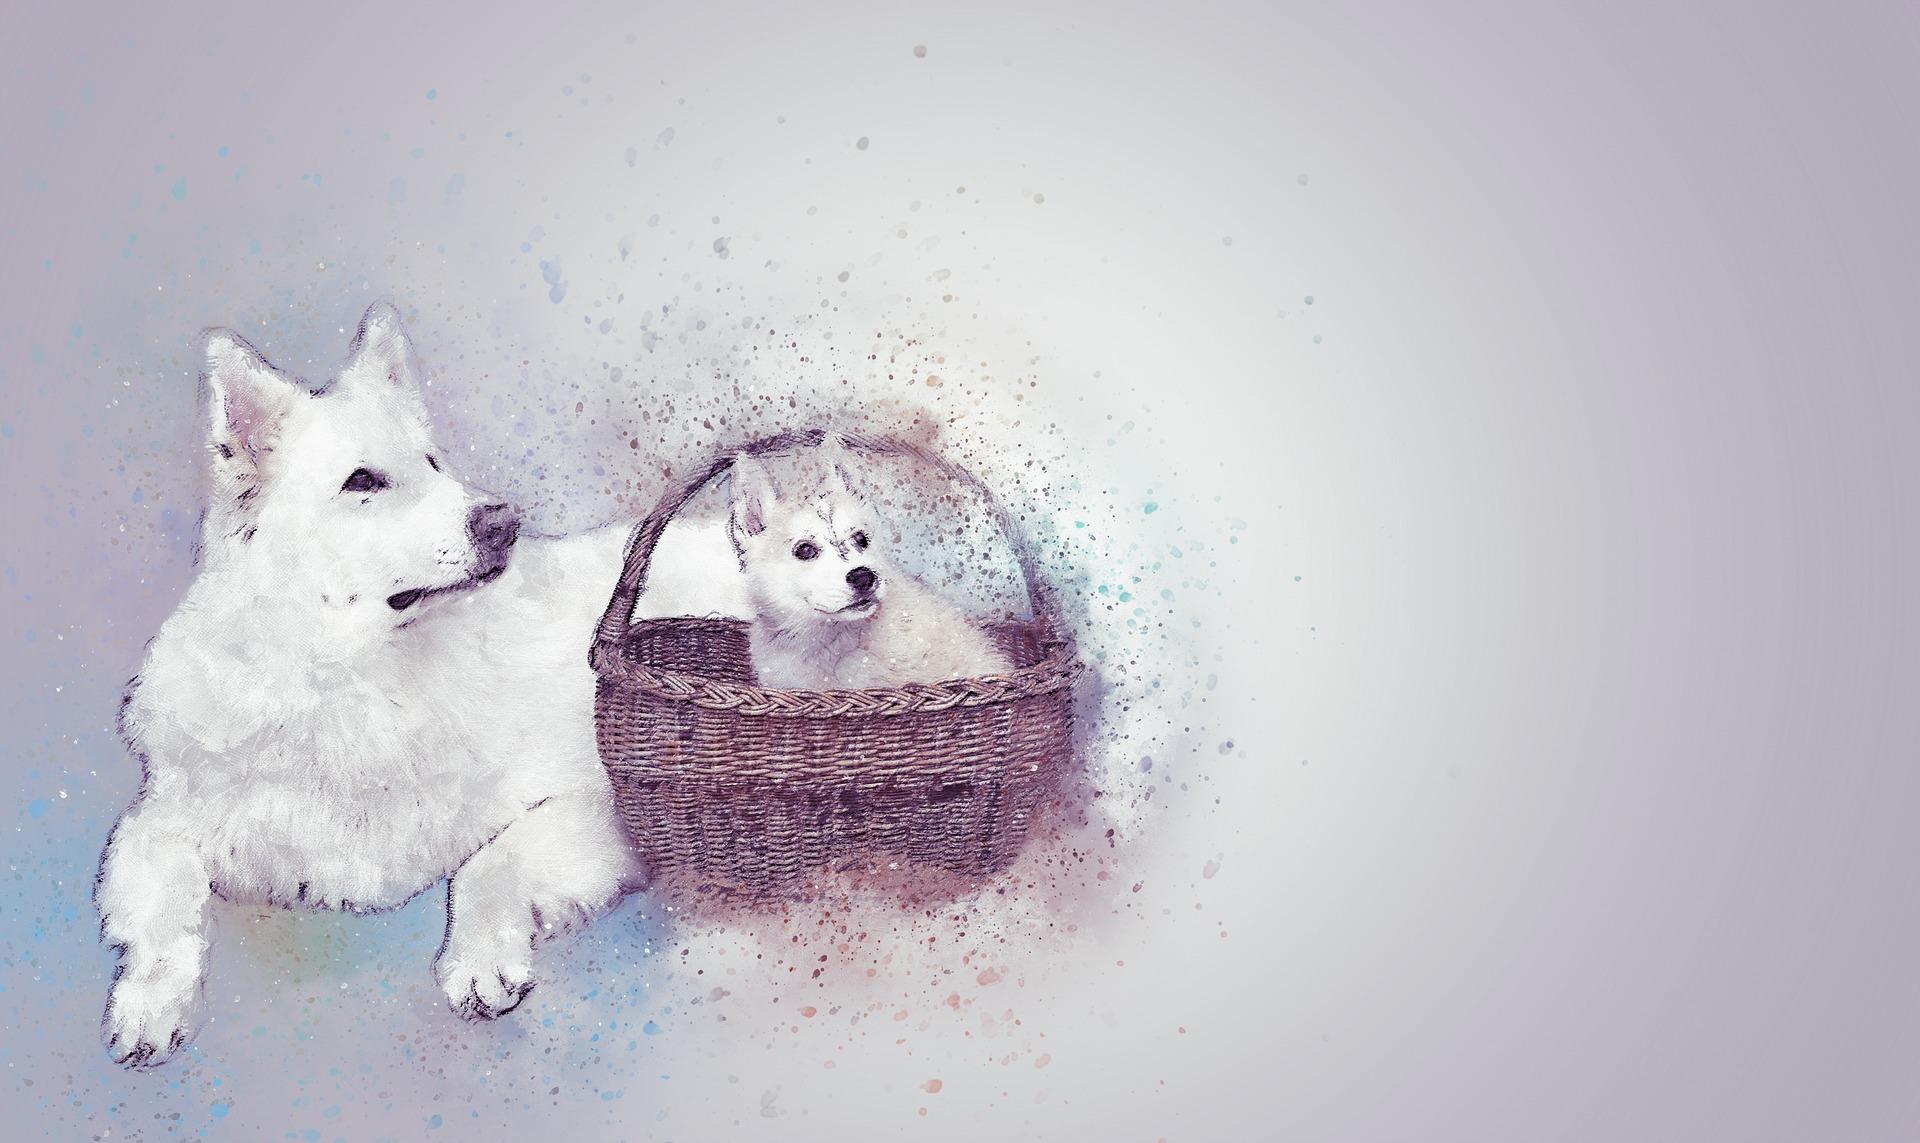 dogs-2205817_1920.jpg